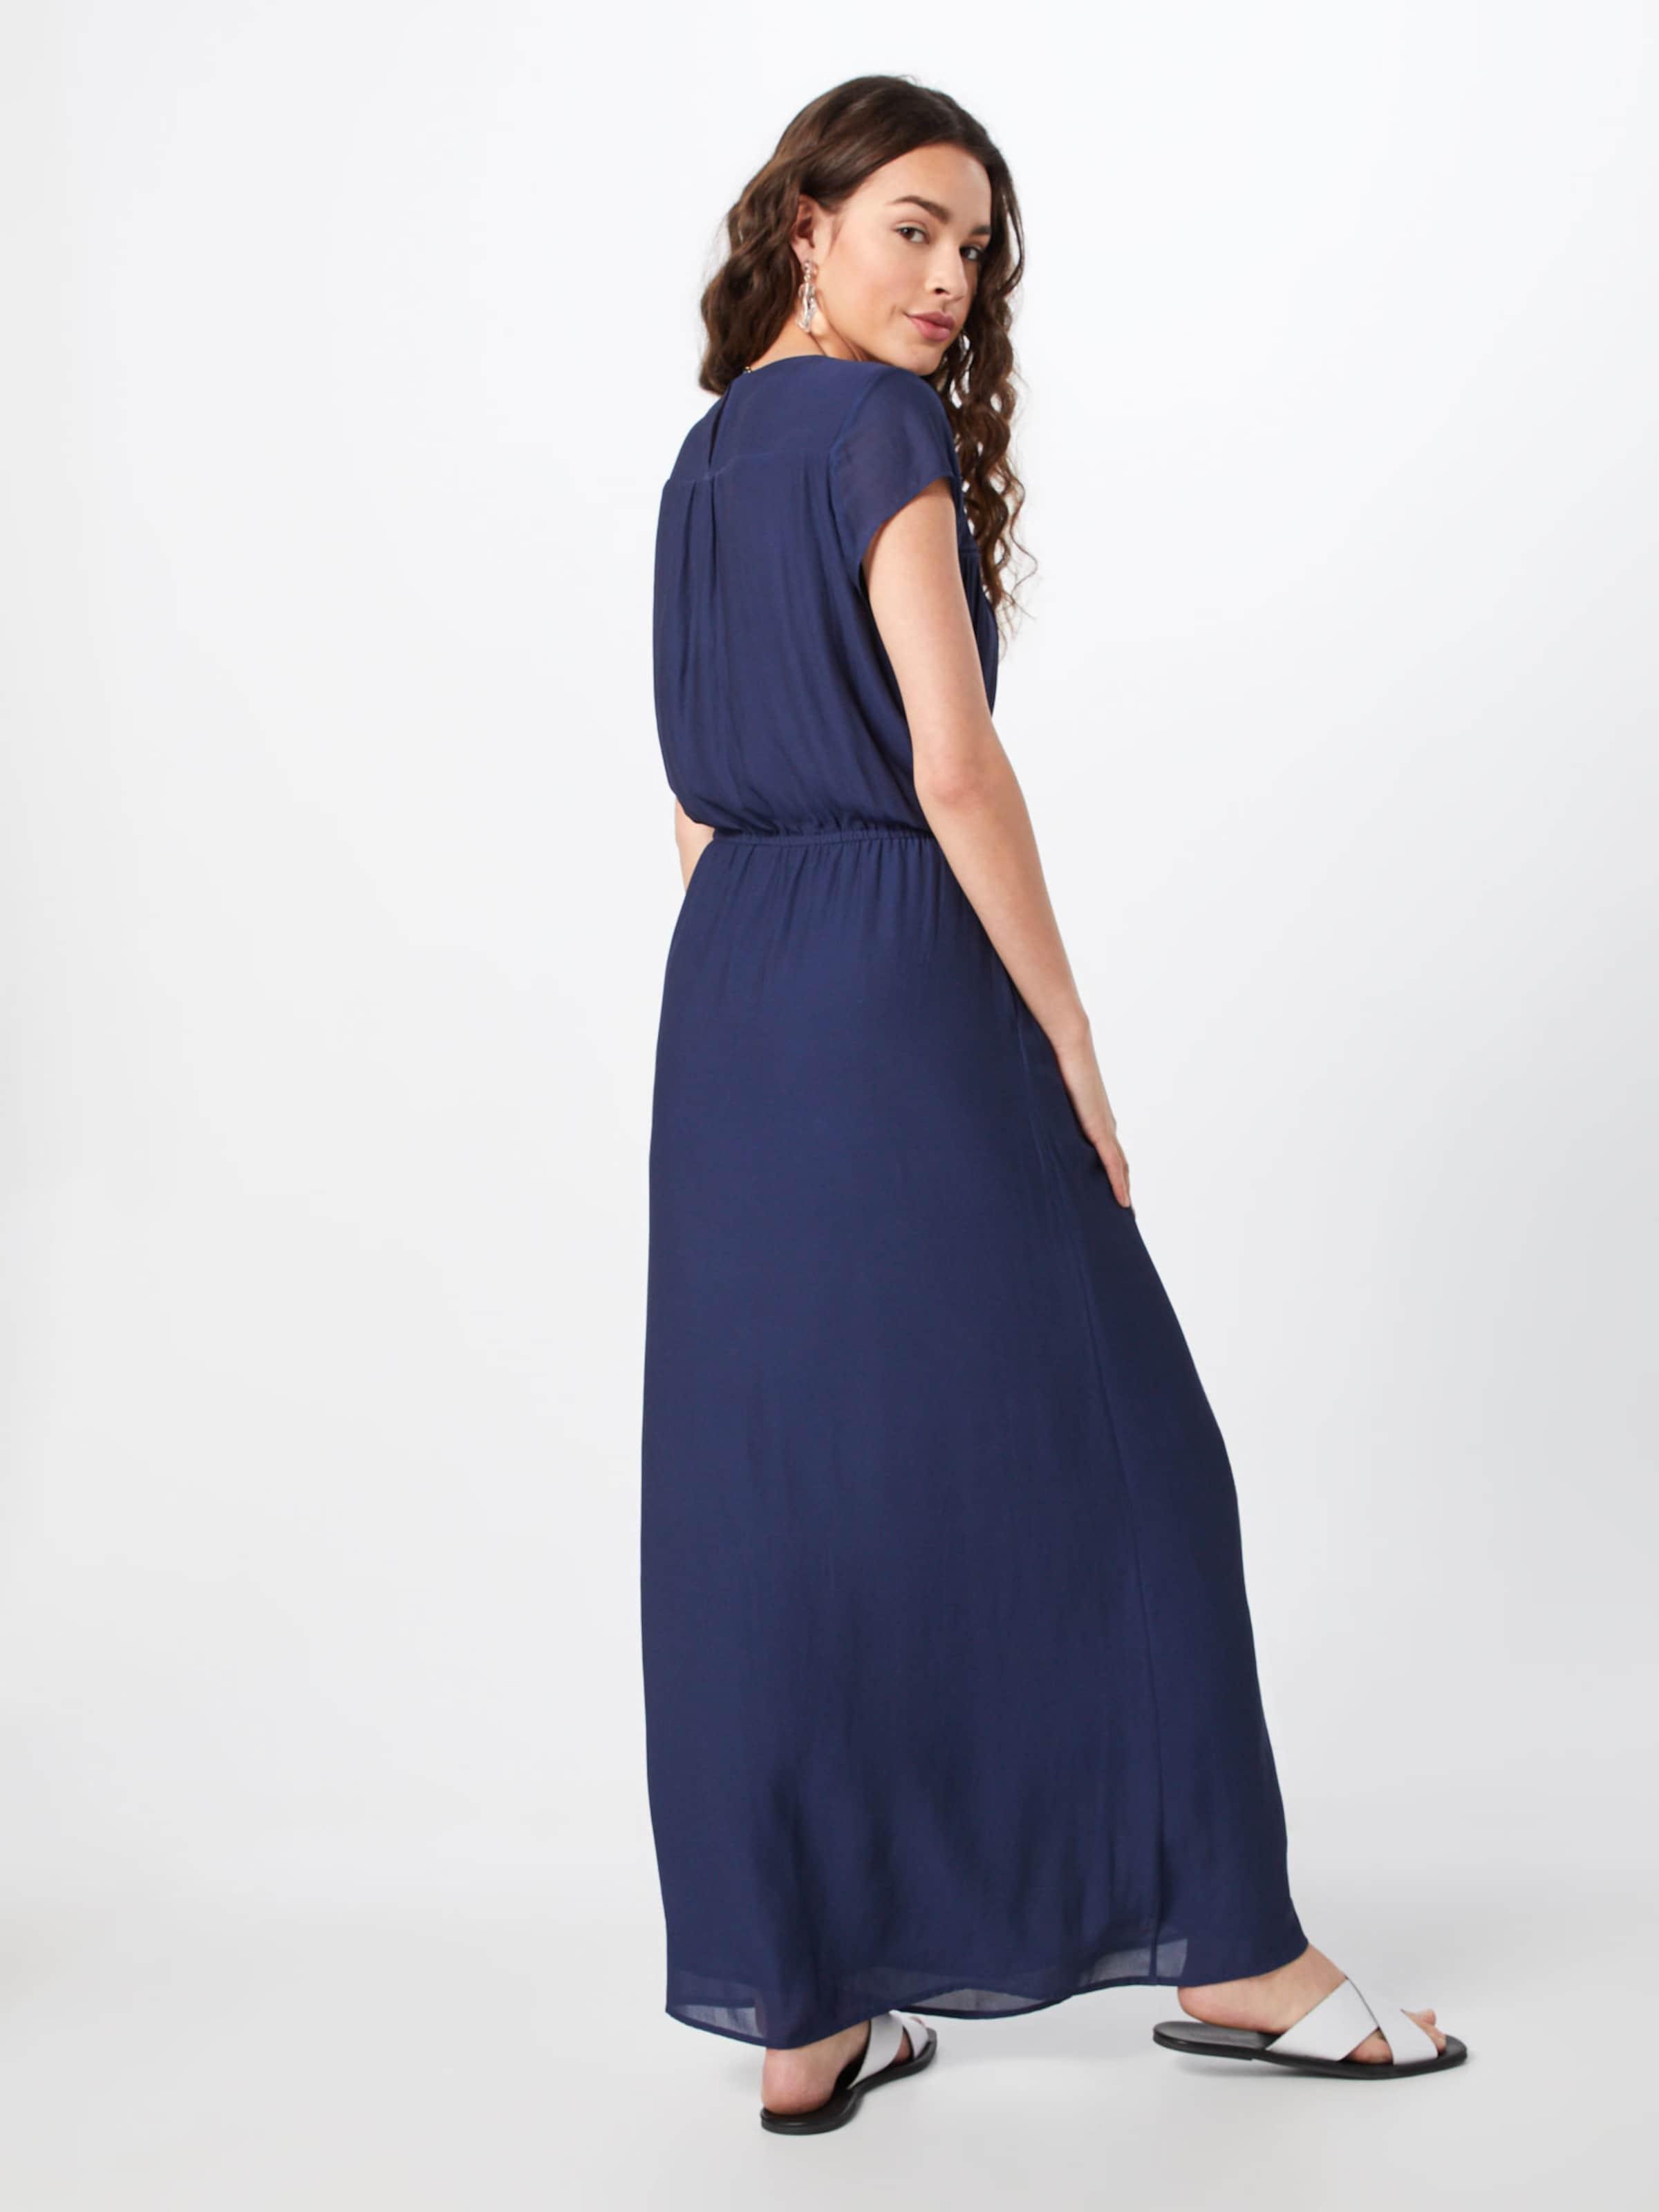 Marine Bleu En Bleu Robe Marine Esprit Esprit En Robe Esprit n80wkPO